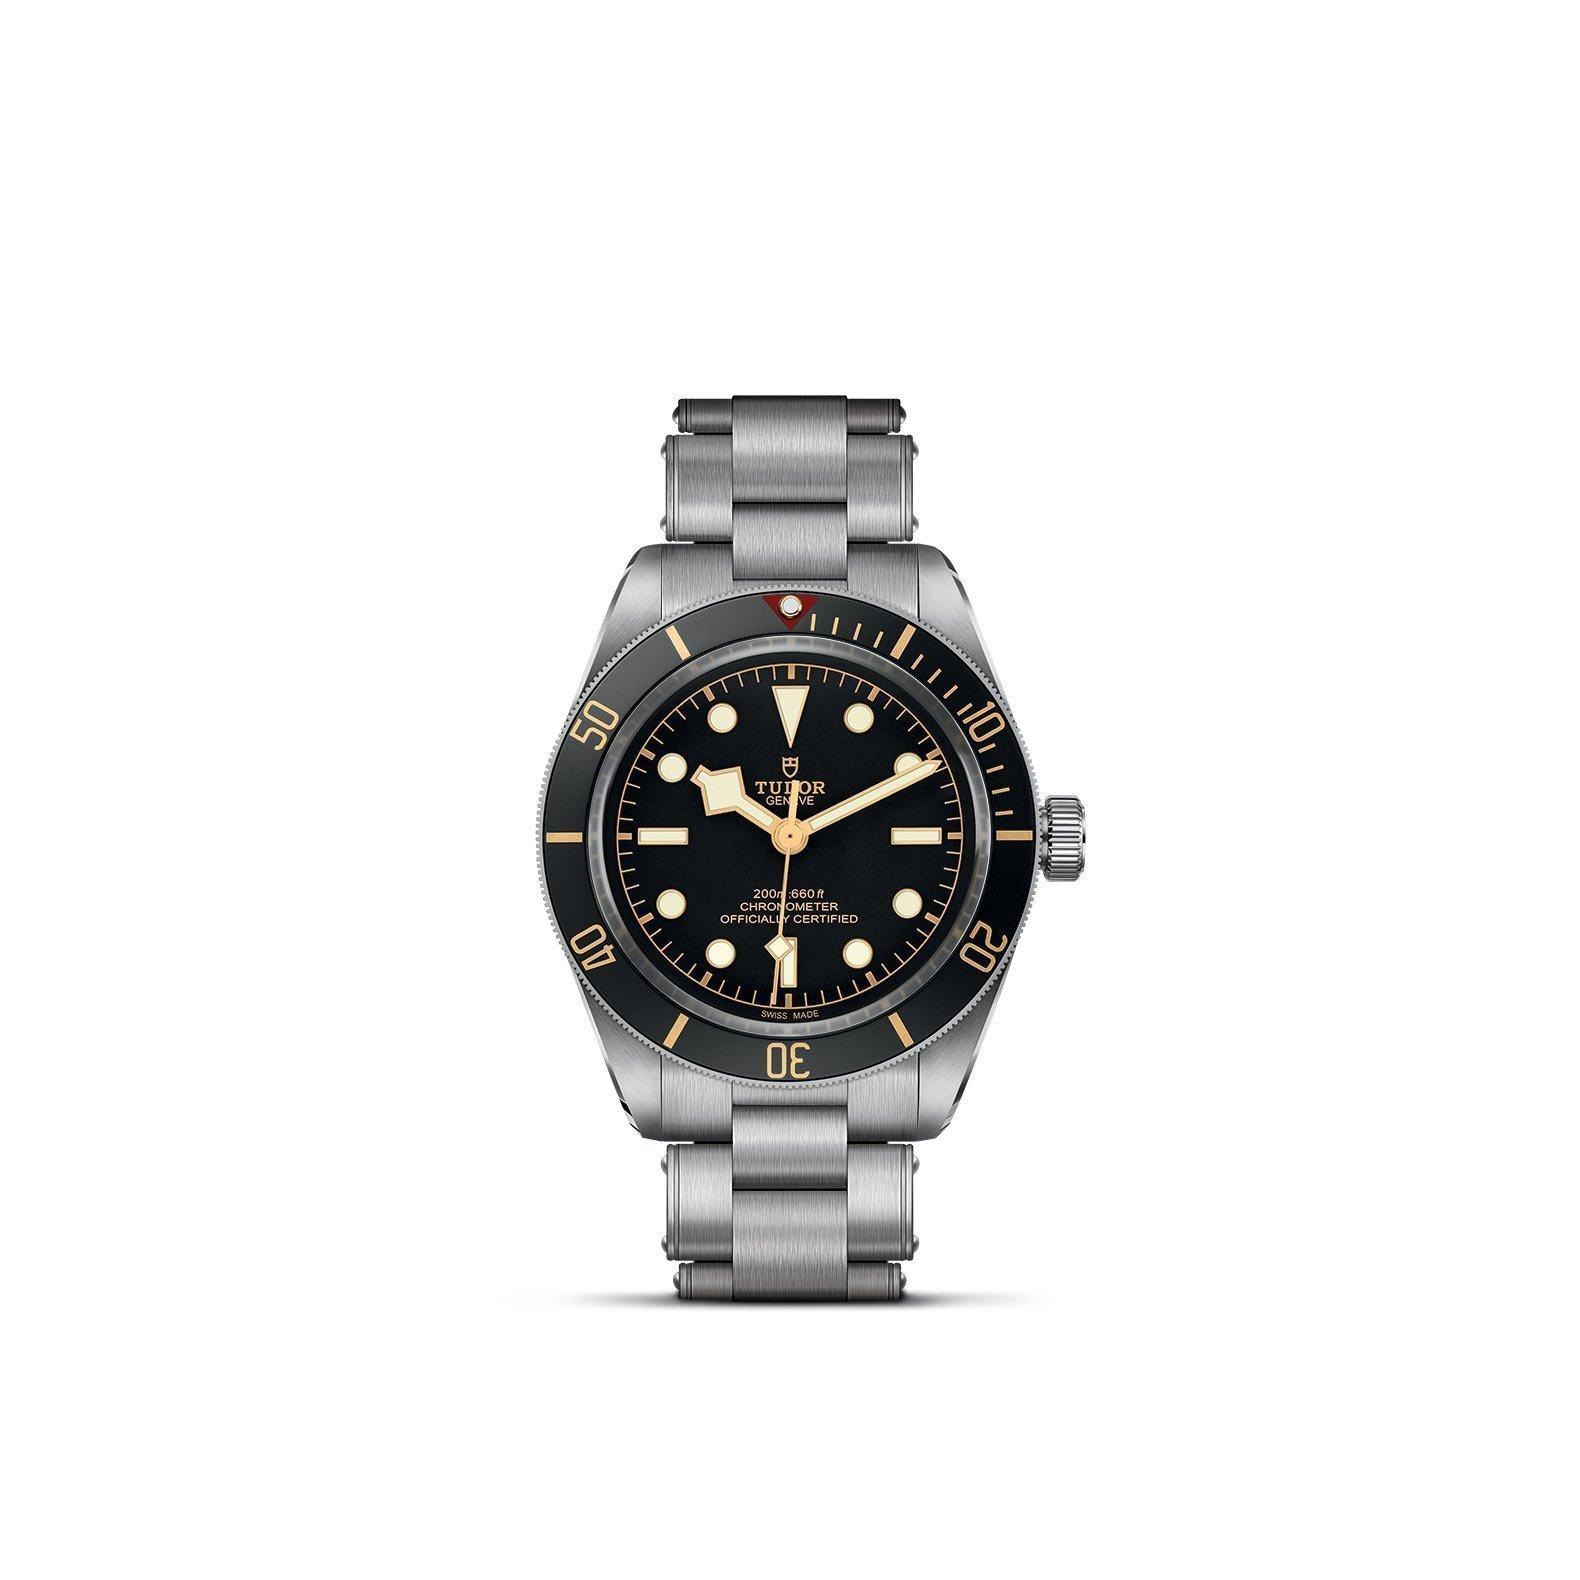 Montre TUDOR Black Bay Fifty-Eight boîtier en acier, 39mm, bracelet en acier vue 1